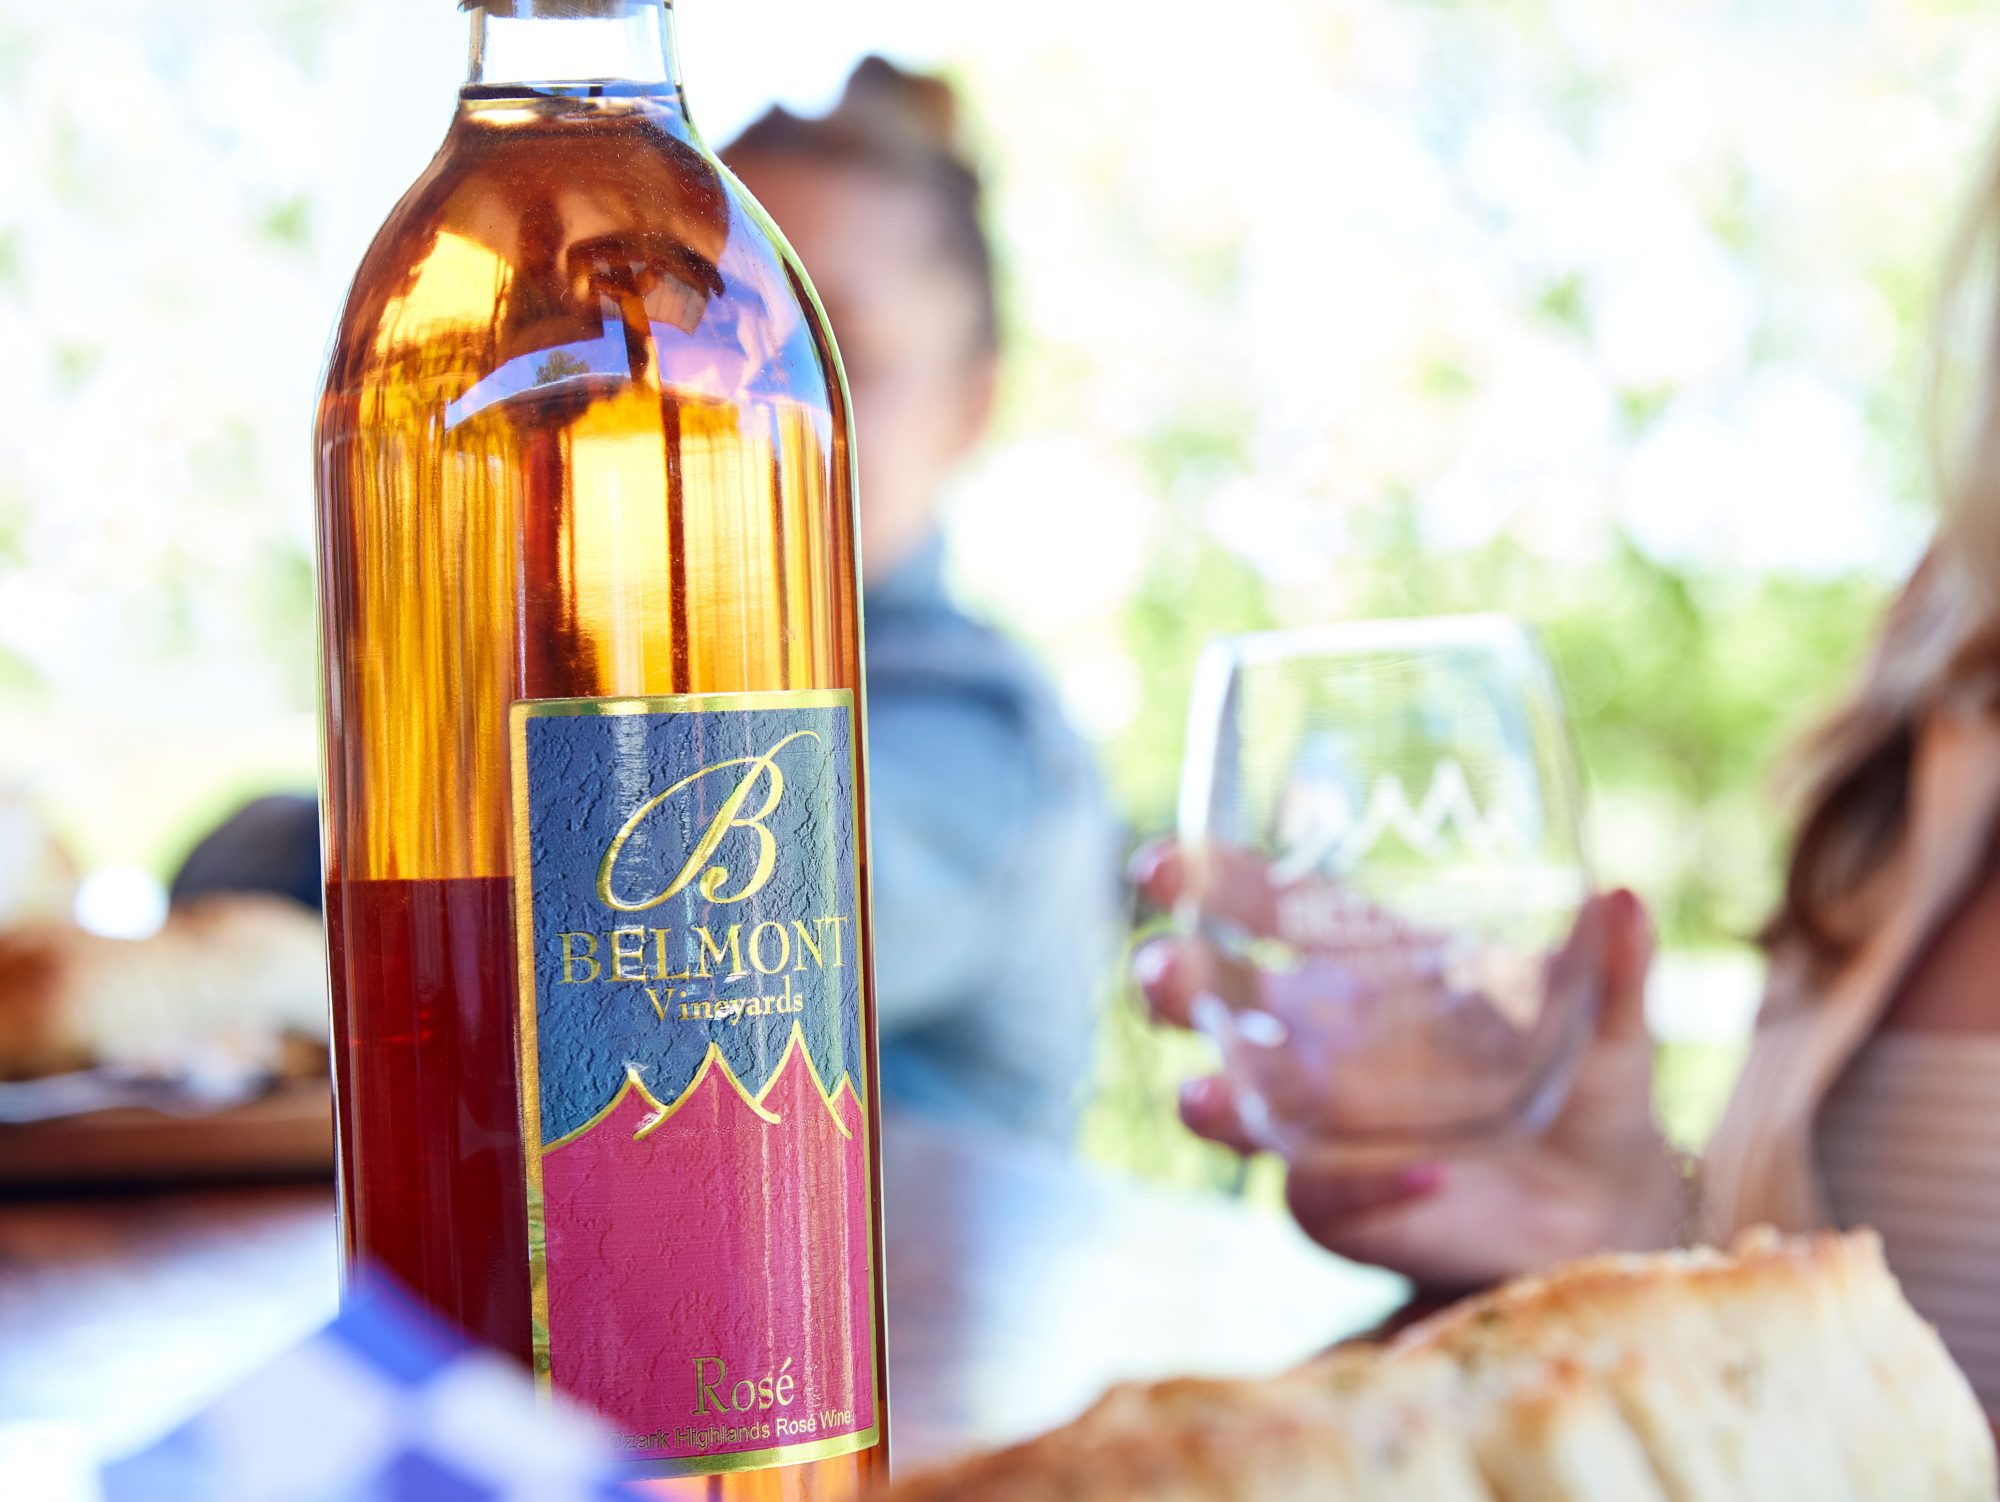 Belmont Vineyards